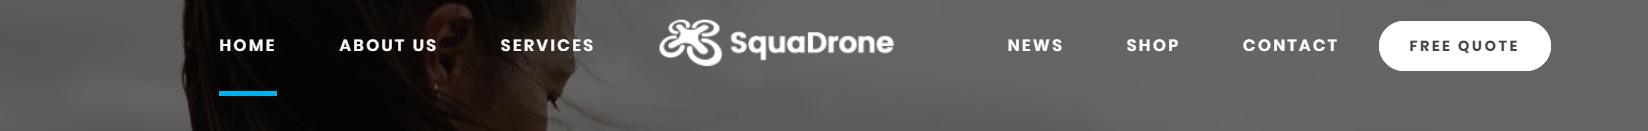 https://documentation.bold-themes.com/squadrone/wp-content/uploads/sites/29/2018/02/menu-horizontal-center.png